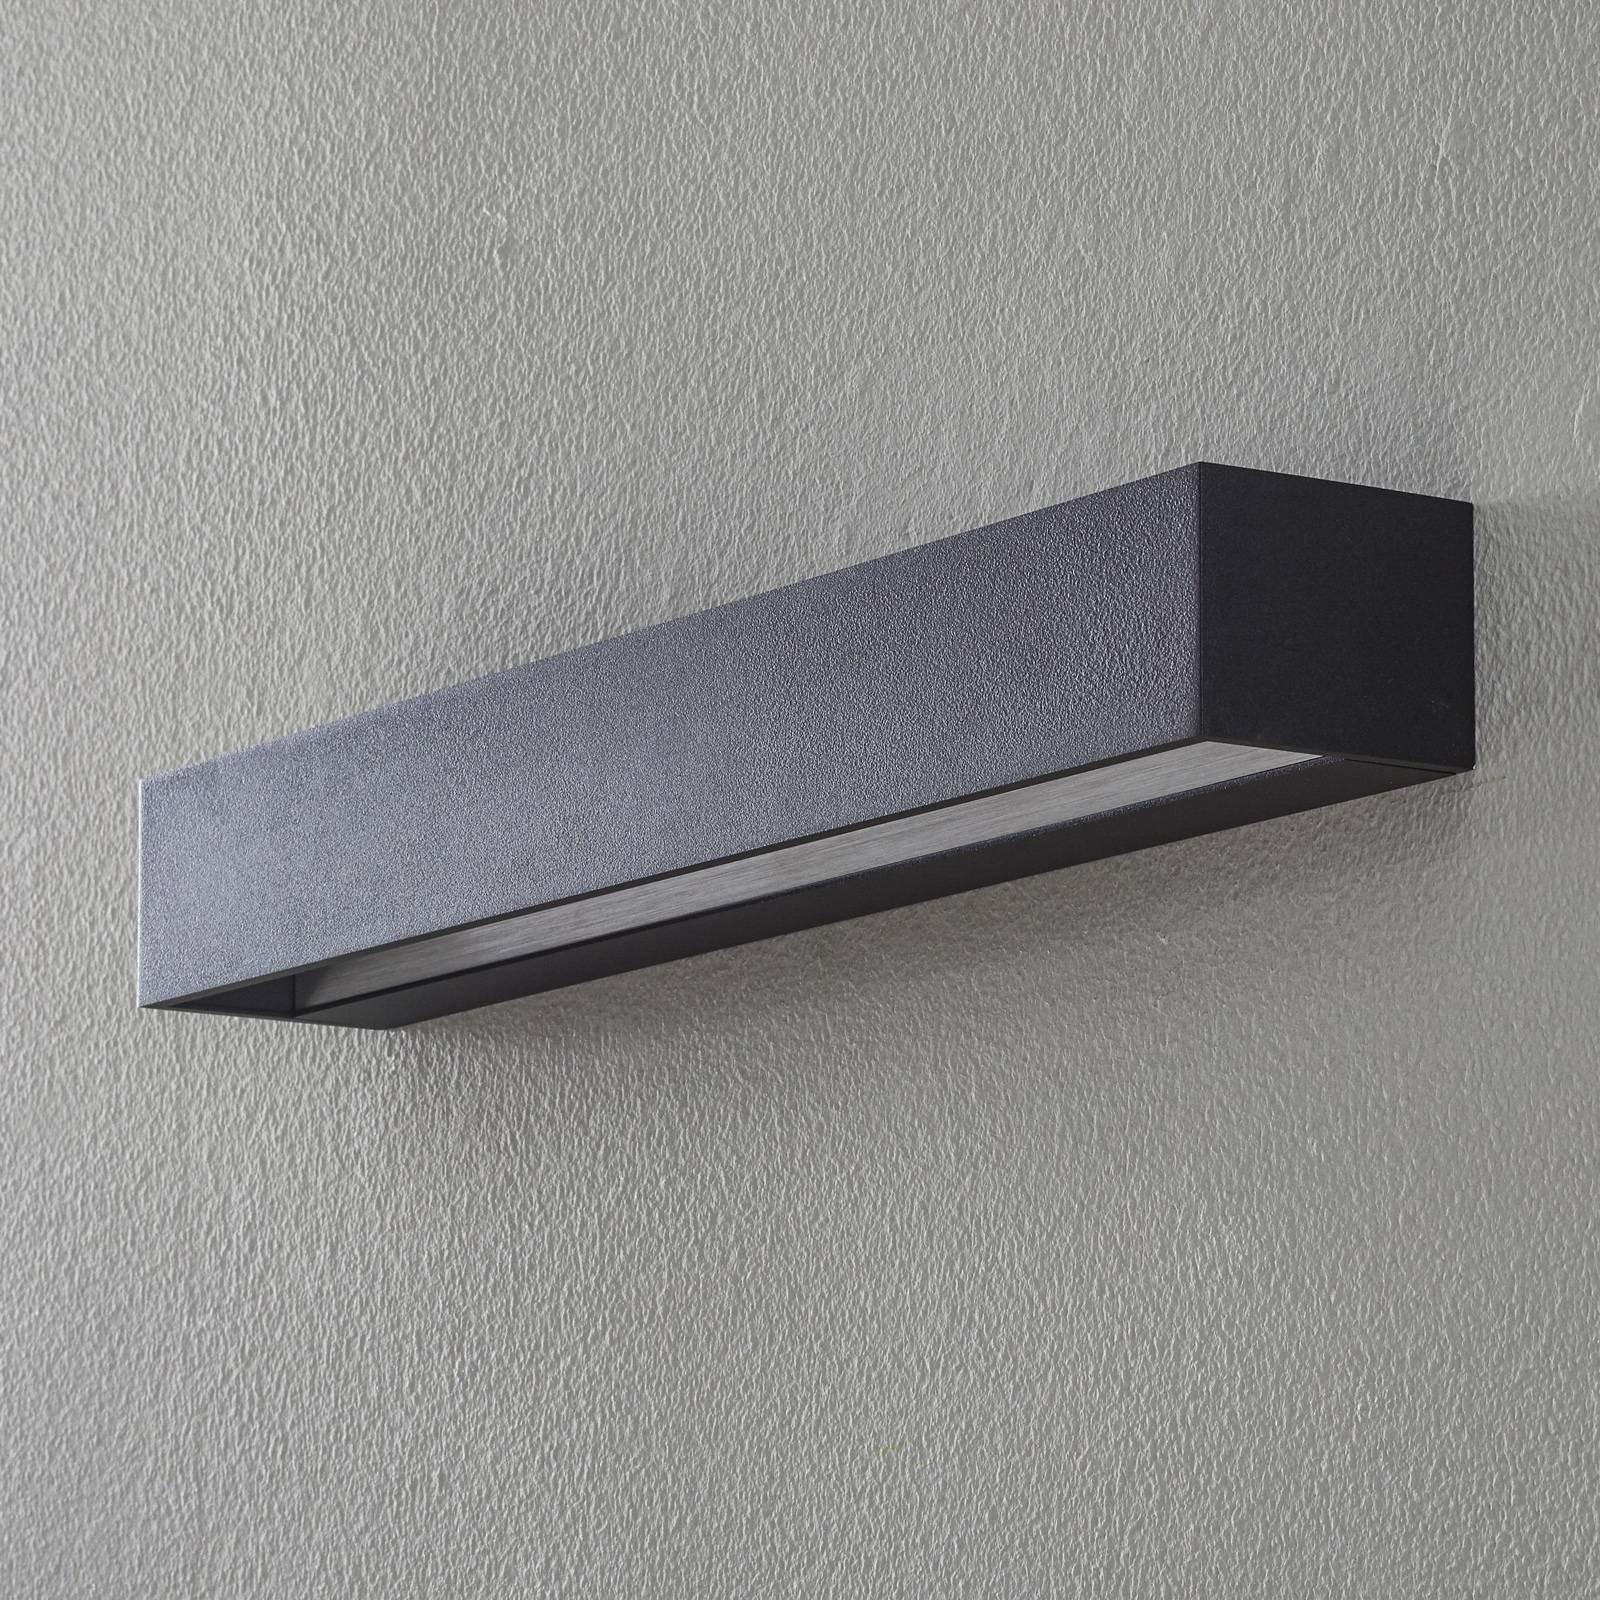 BEGA Studio Line vegglampe bred svart/alu 50 cm